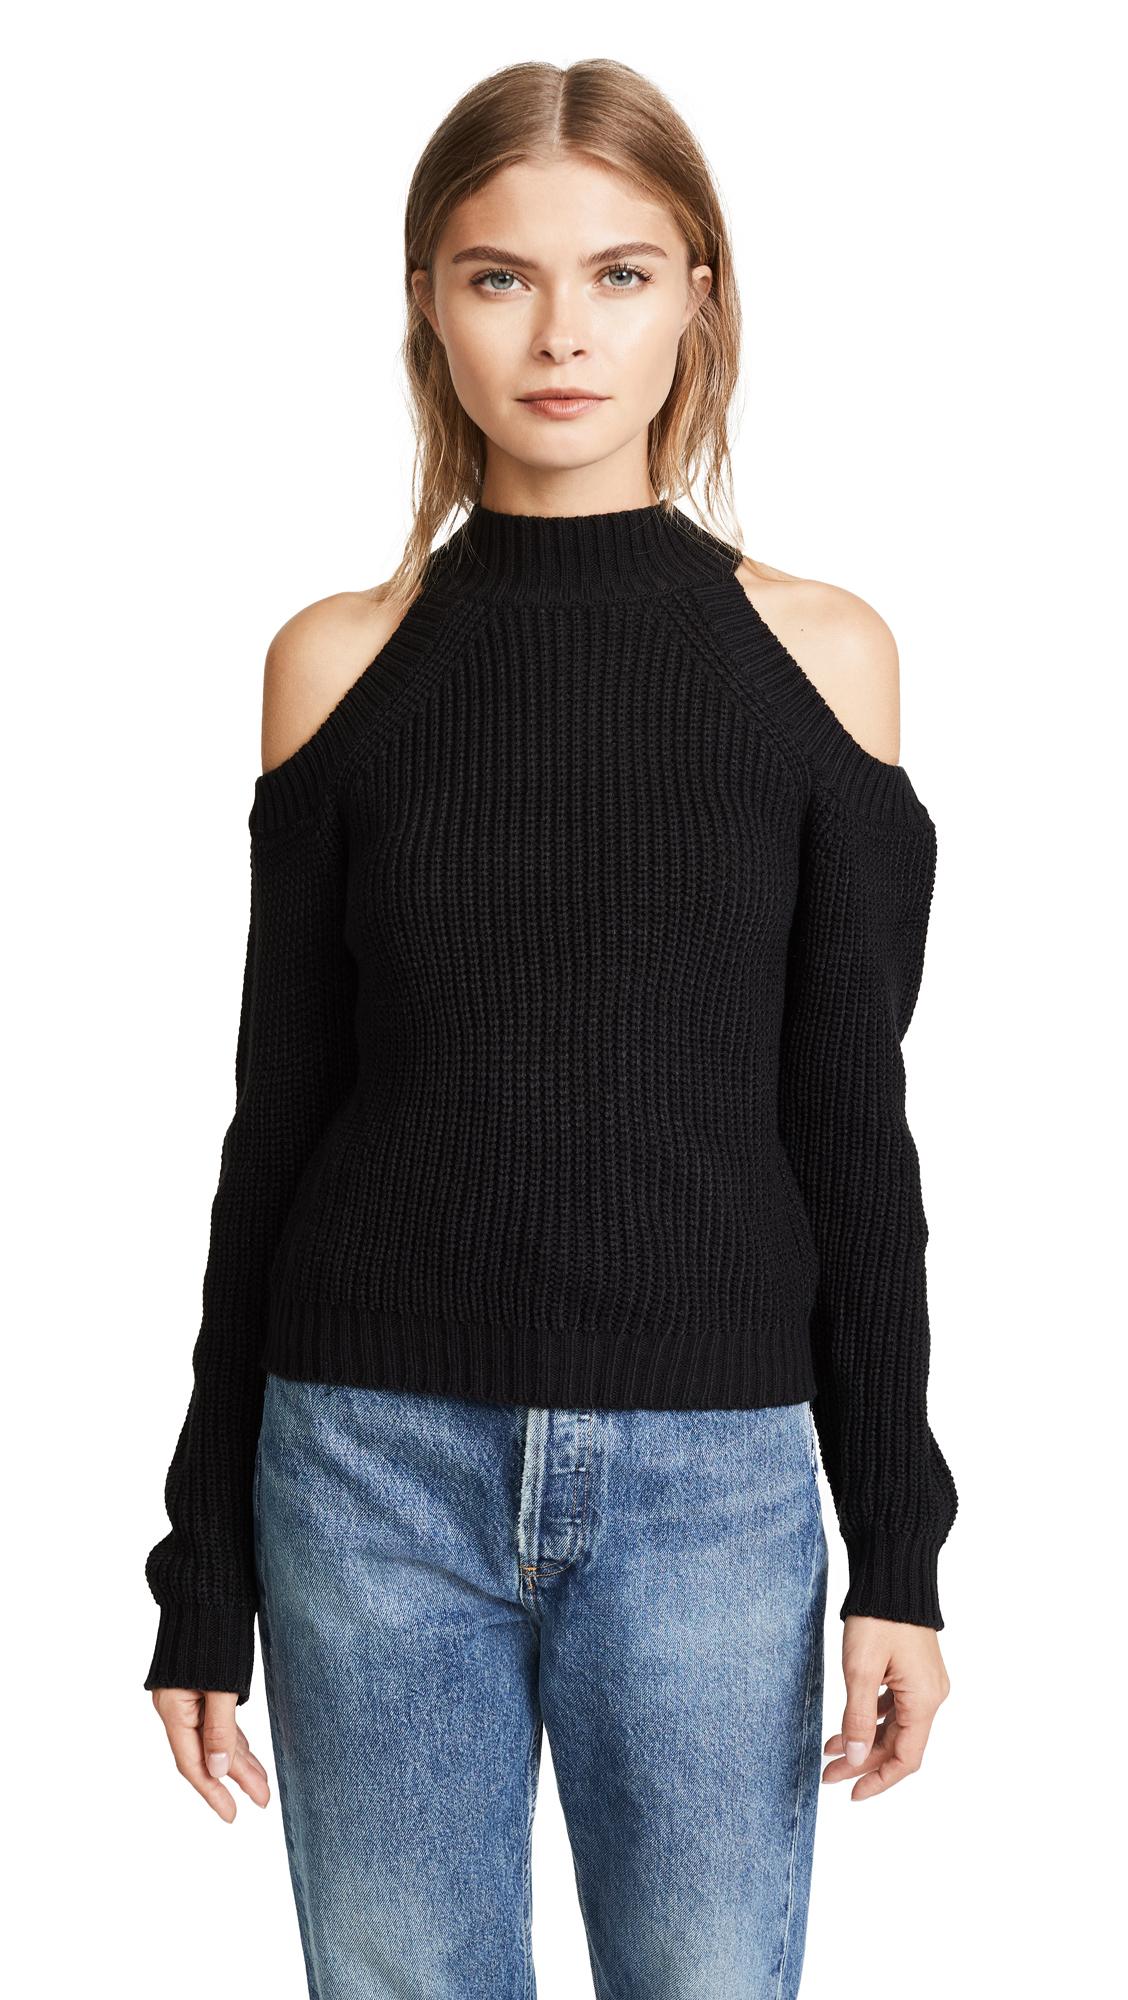 BB Dakota Jack By BB Dakota Mai Sweater - Black